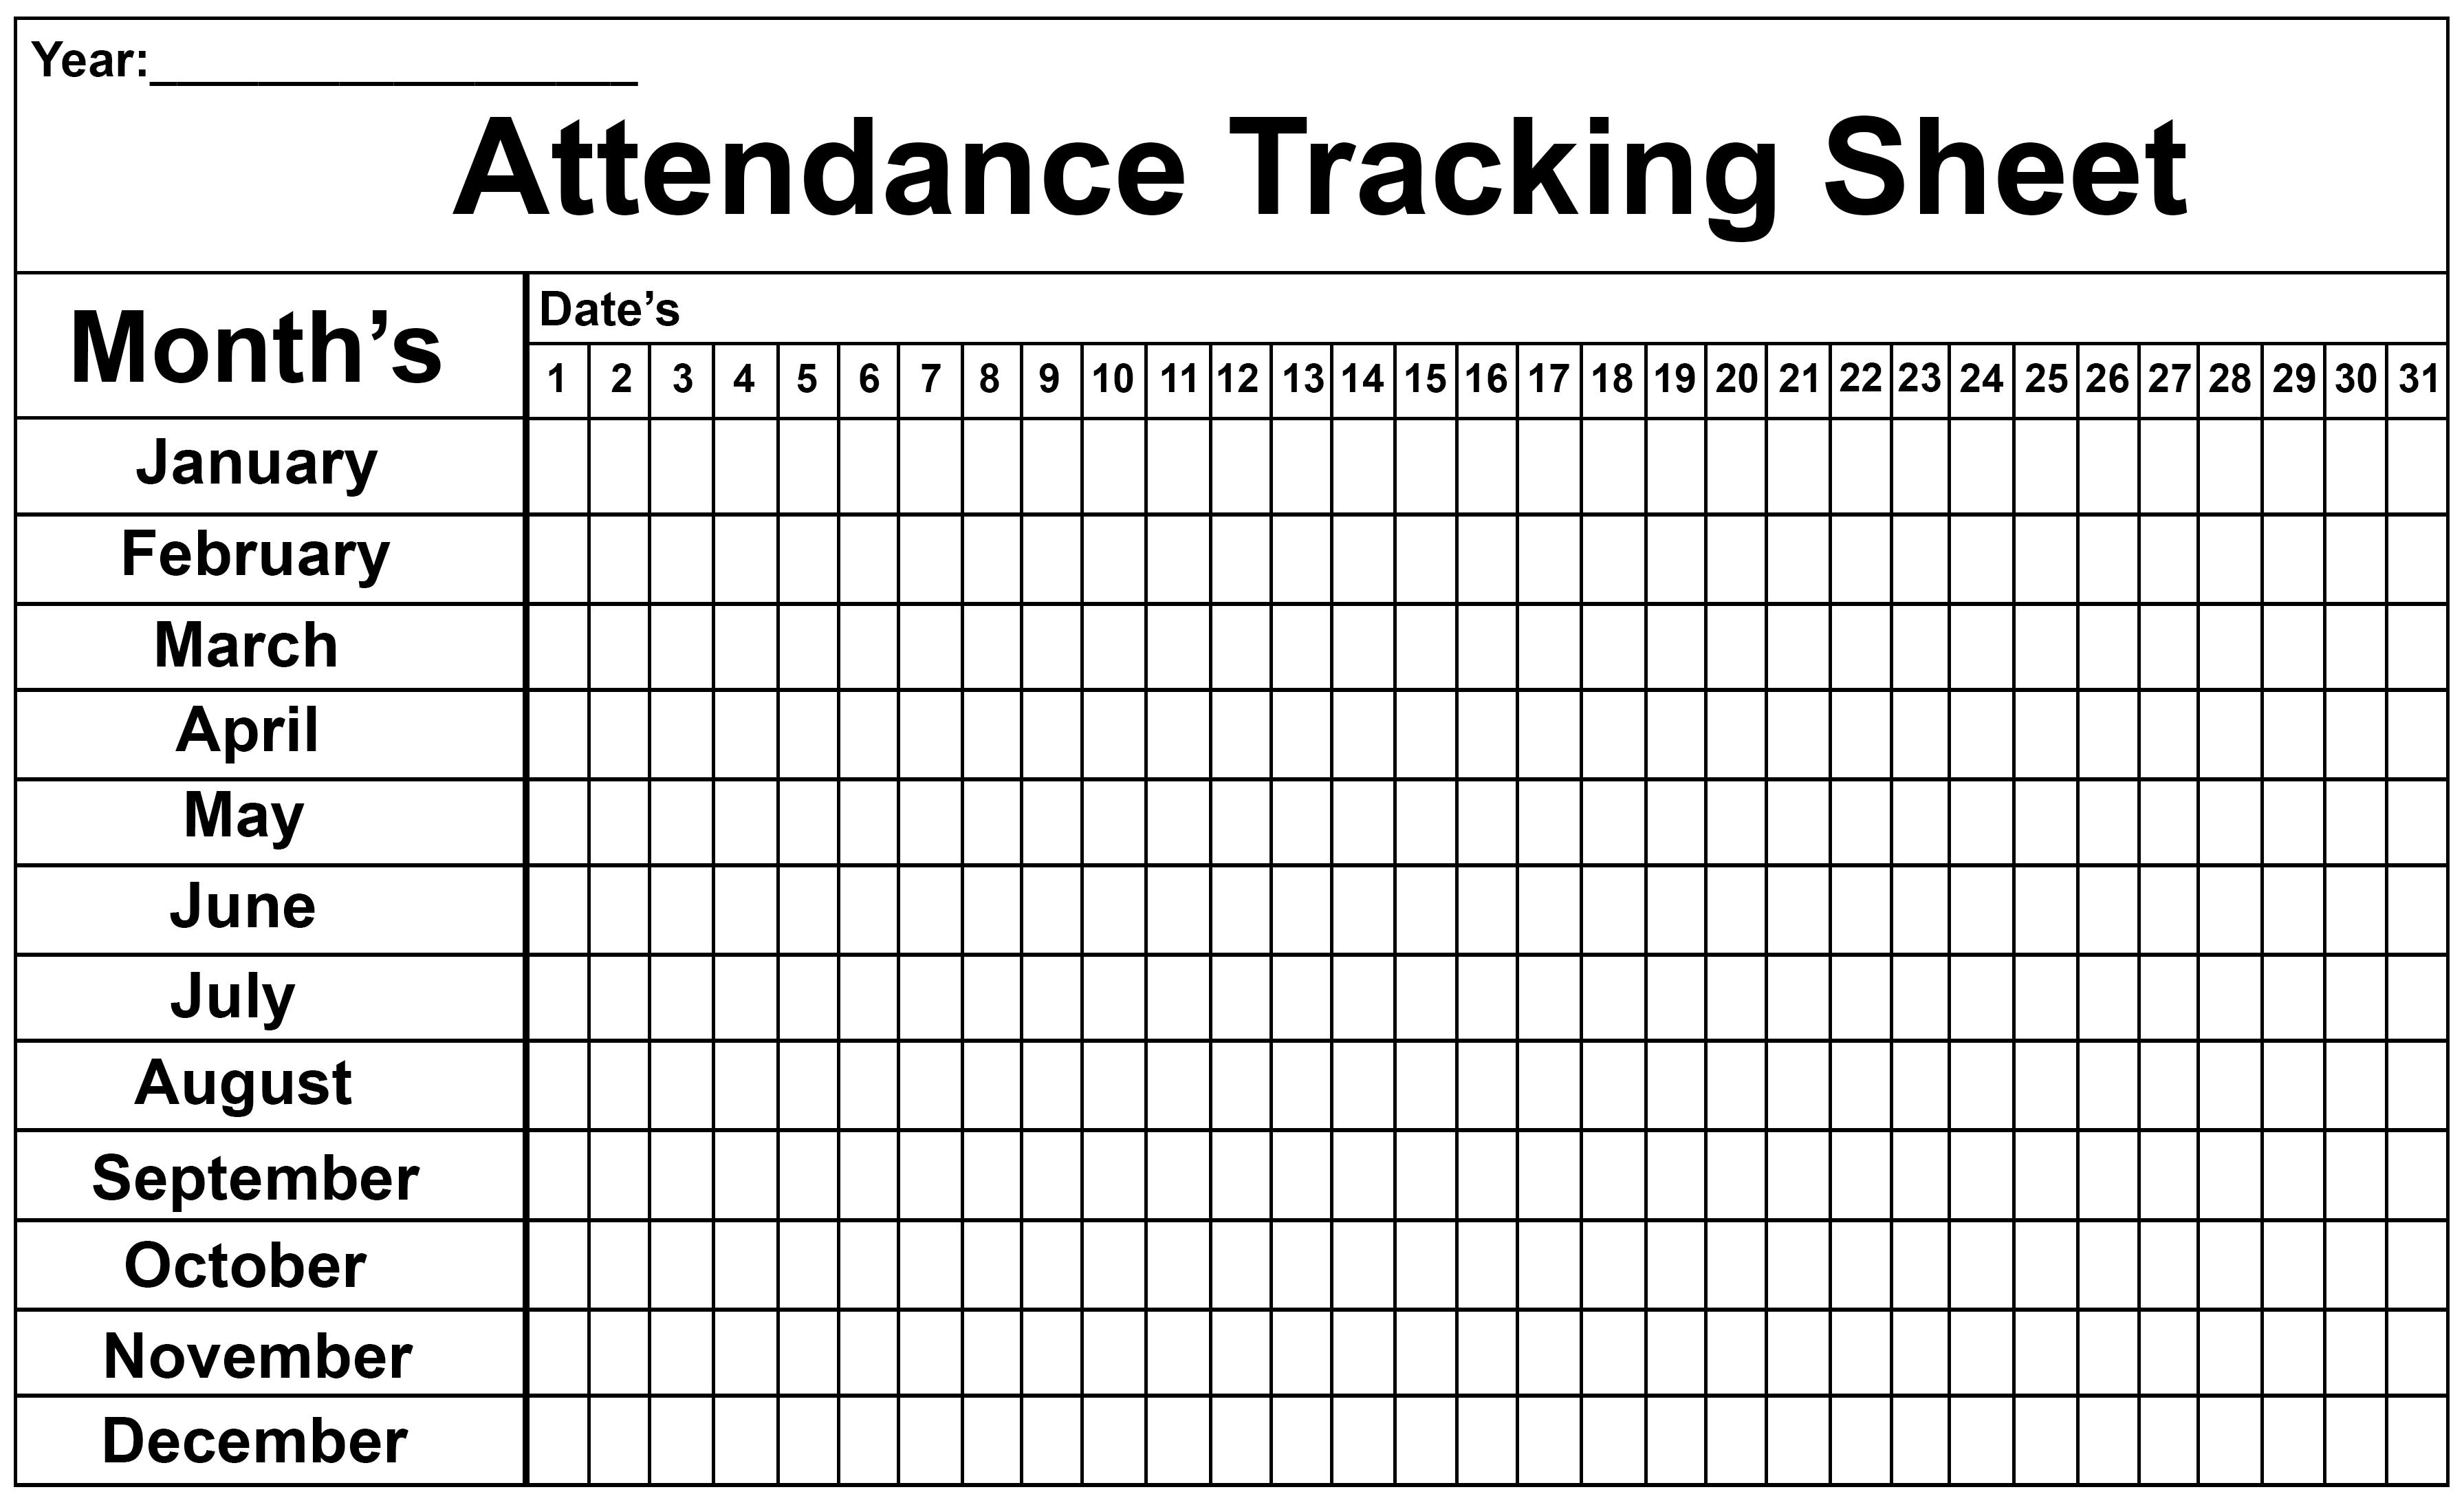 Employee Attendance Tracker Sheet 2019 | Printable Calendar Diy within Printable Employee Attendance Calendar Template